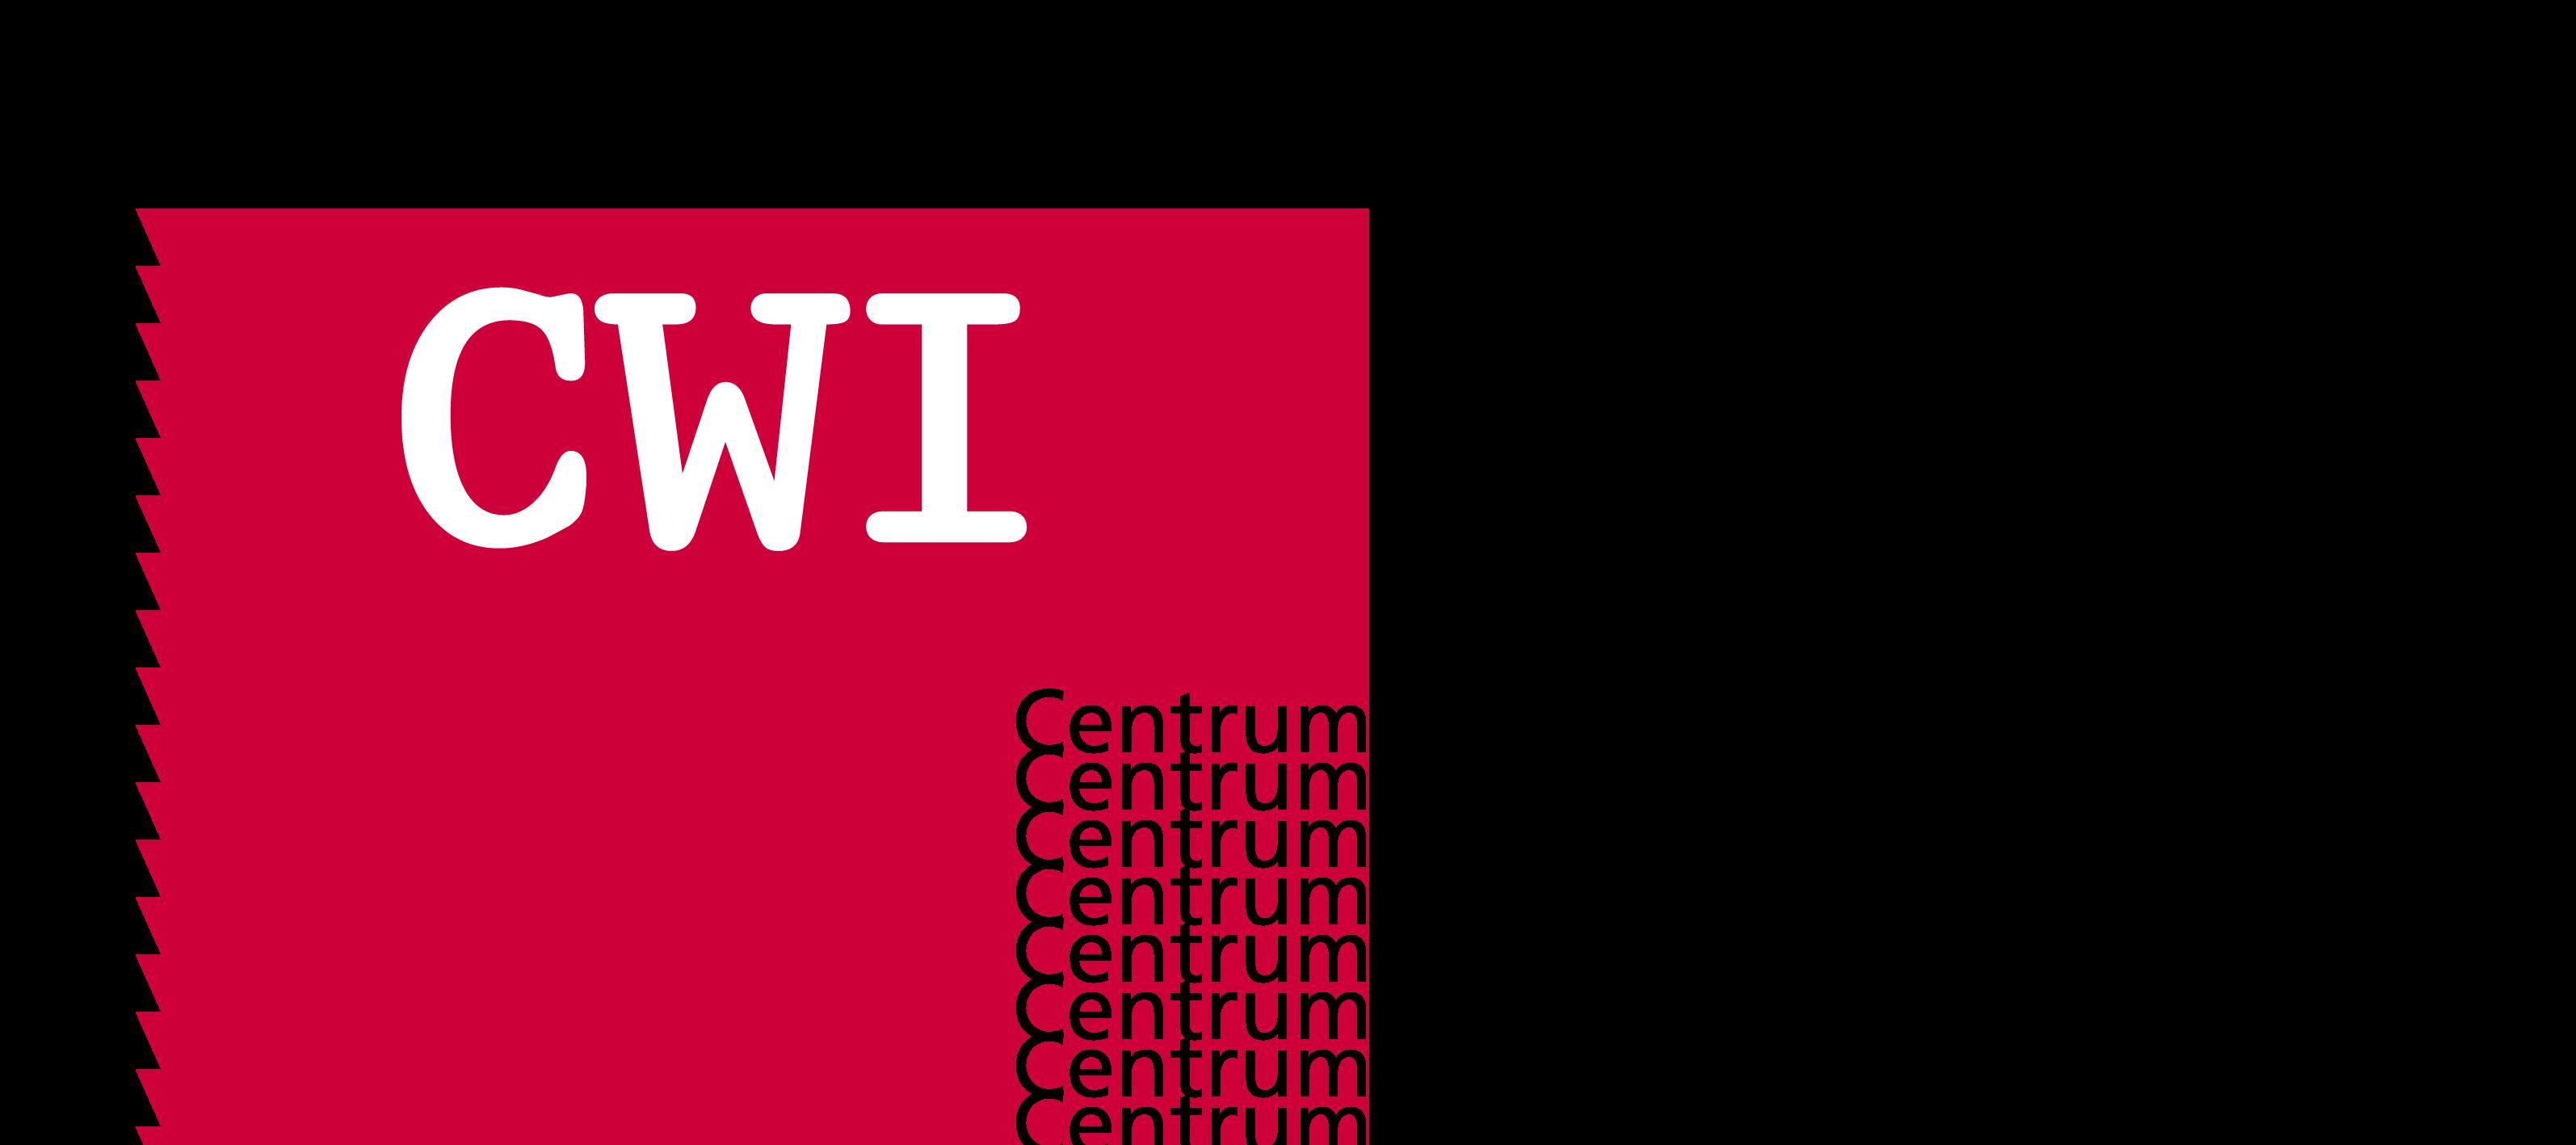 Logo Centrum Wiskunde & Informatica